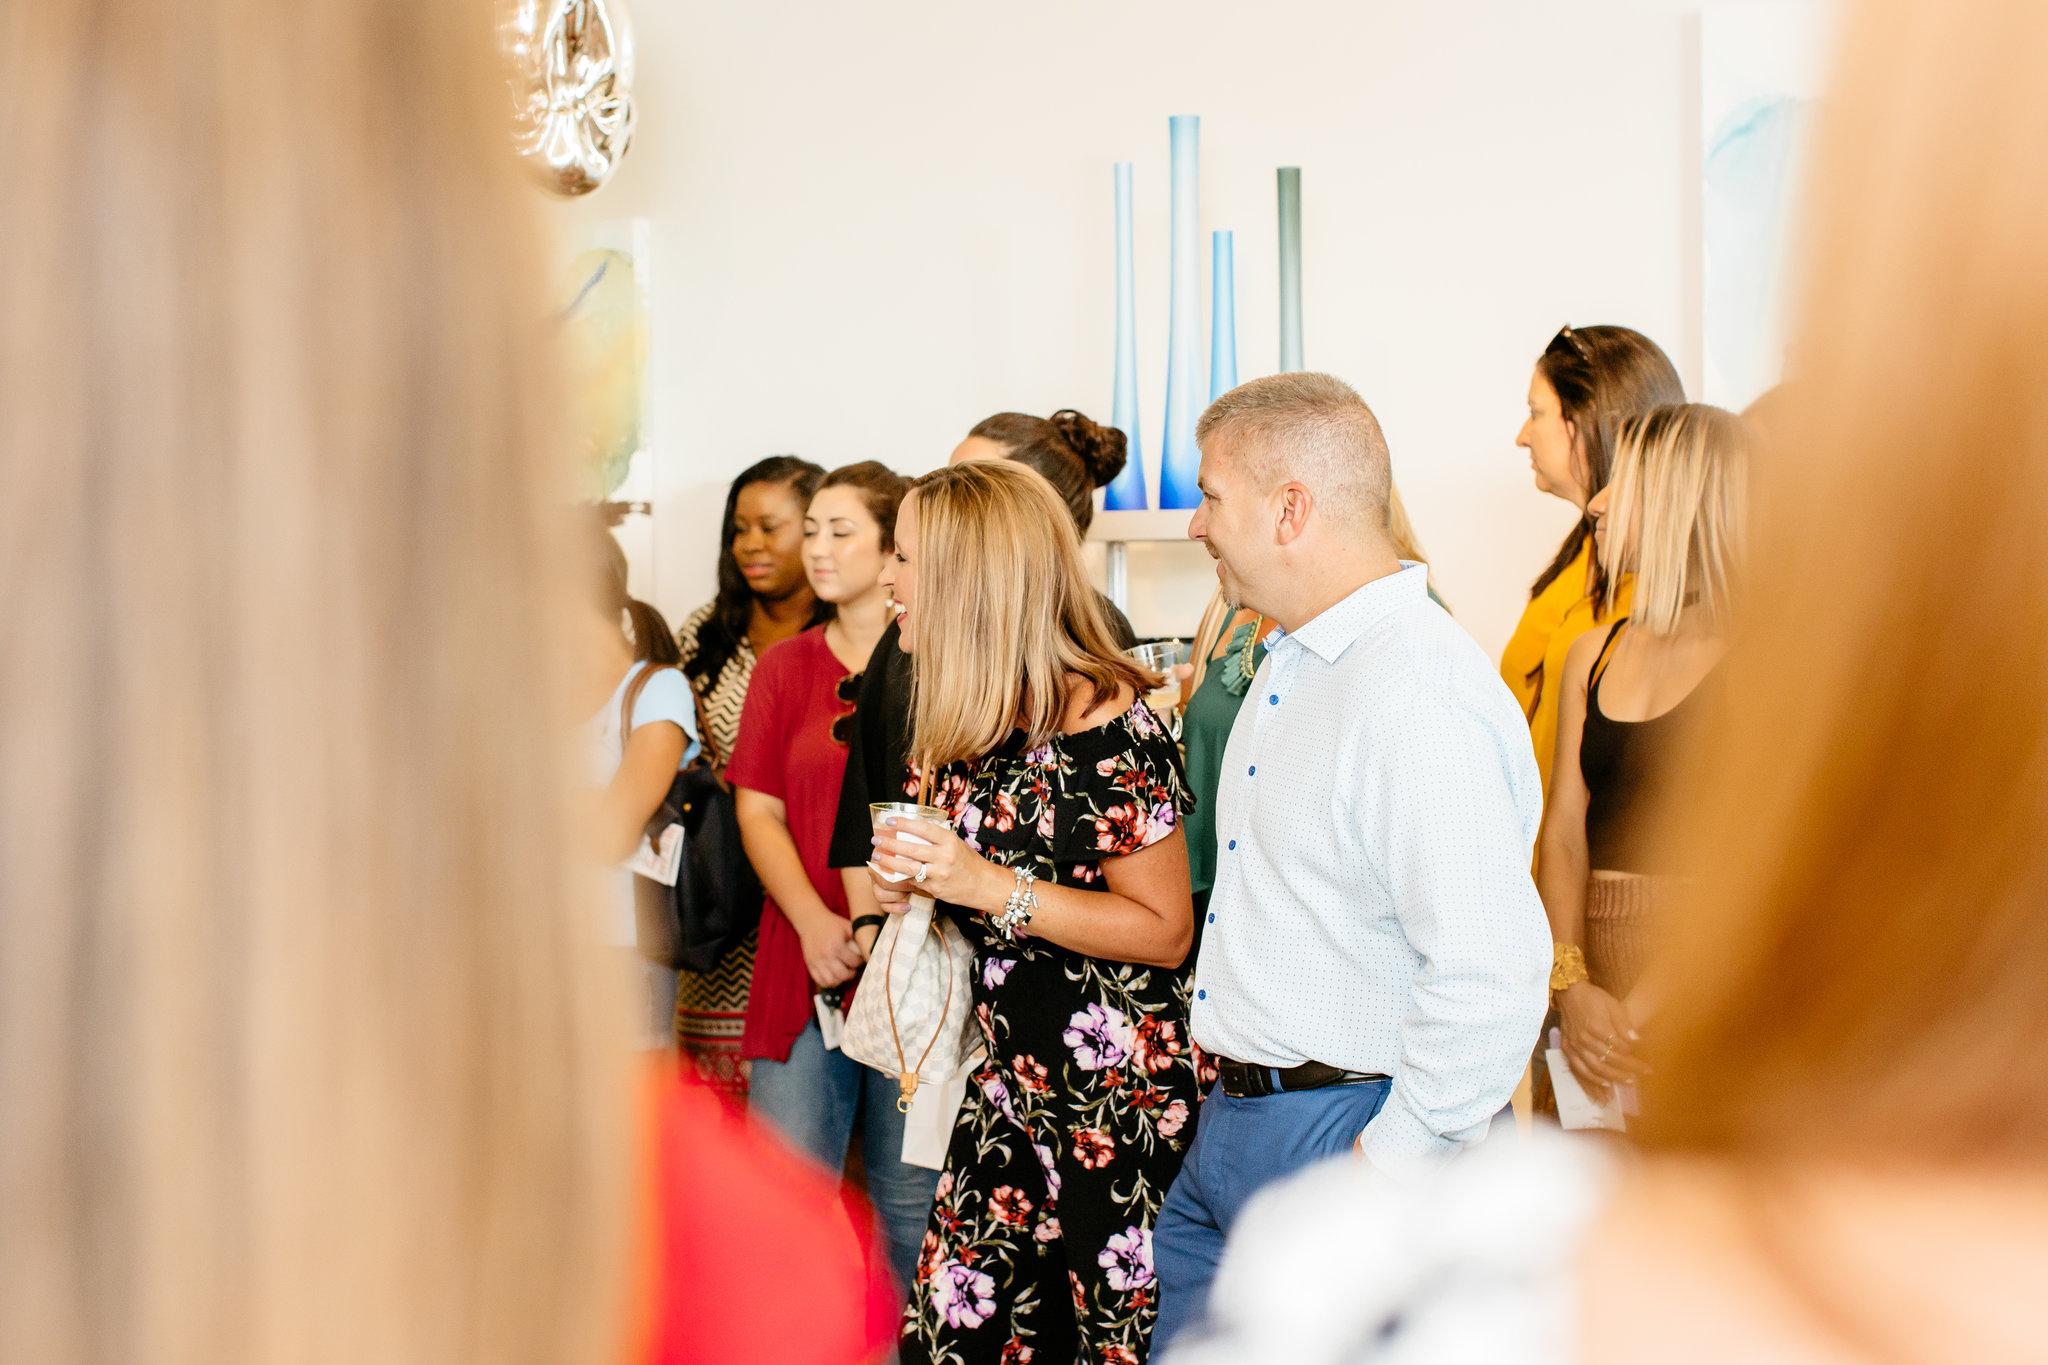 Alexa-Vossler-Photo_Dallas-Event-Photographer_Brite-Bar-Beauty-2018-Lipstick-Launch-Party-106.jpg